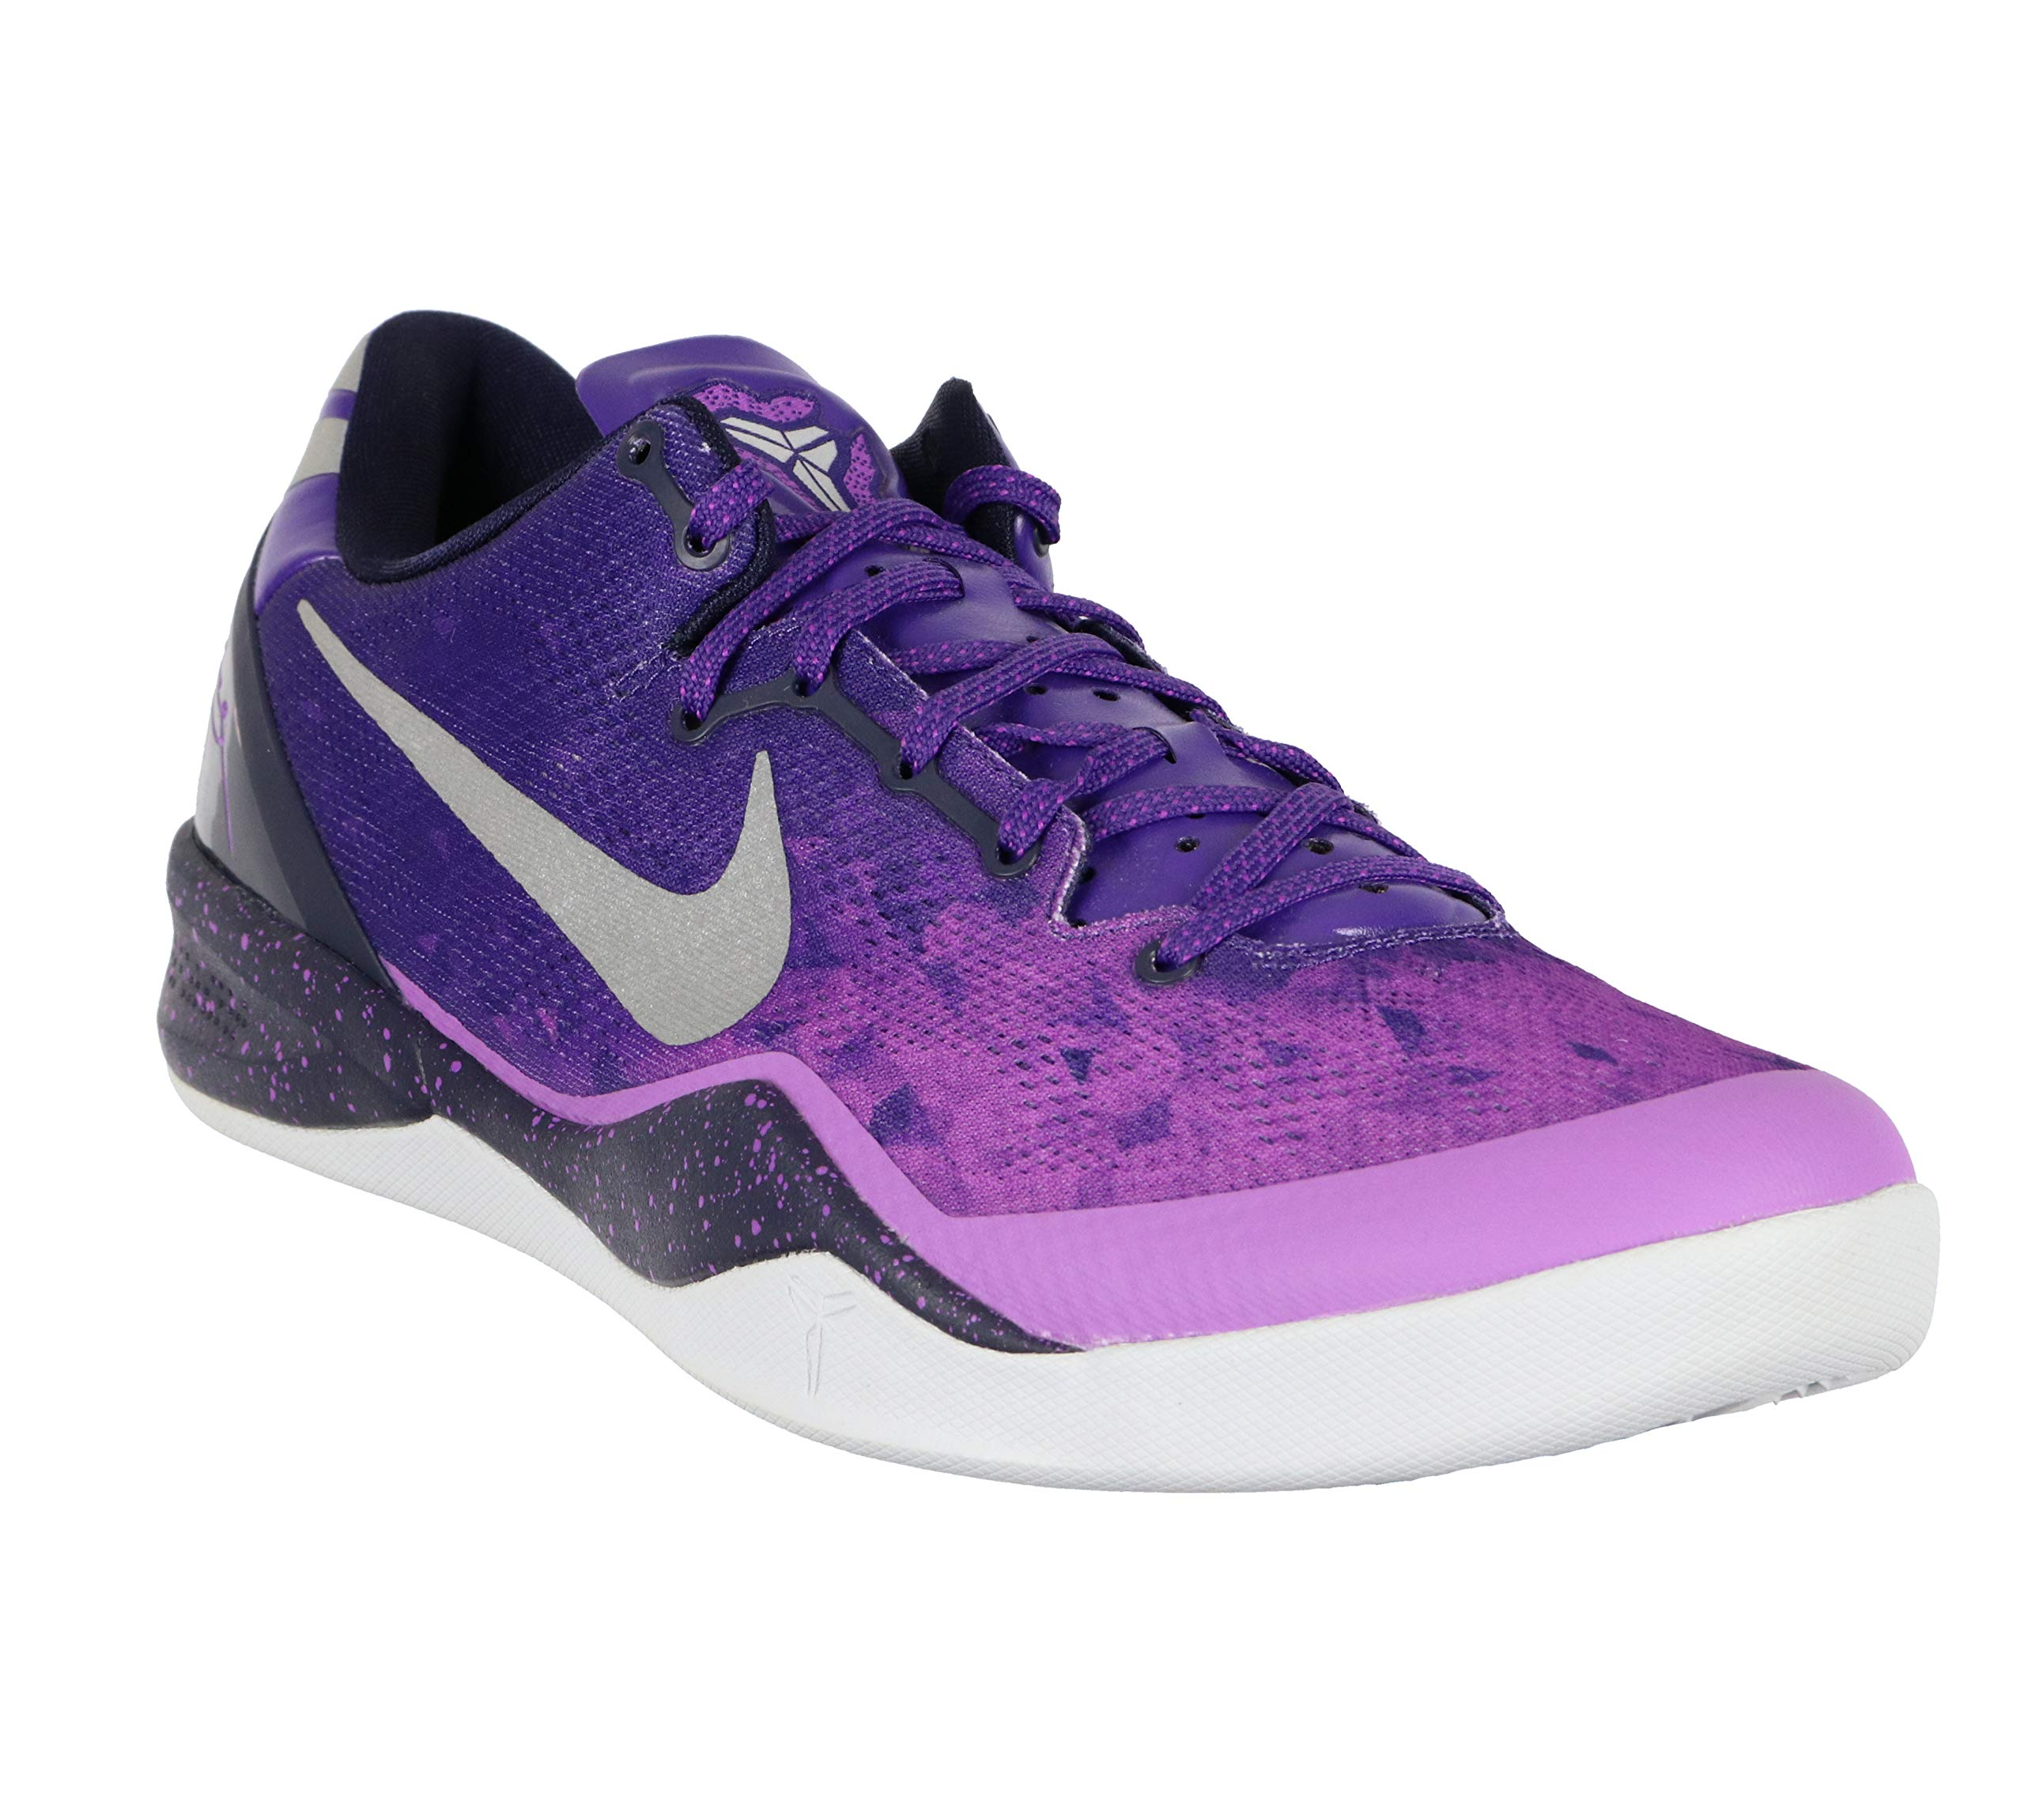 Nike Kobe 8 System - Zapatillas de baloncesto para hombre (13,5 m ...